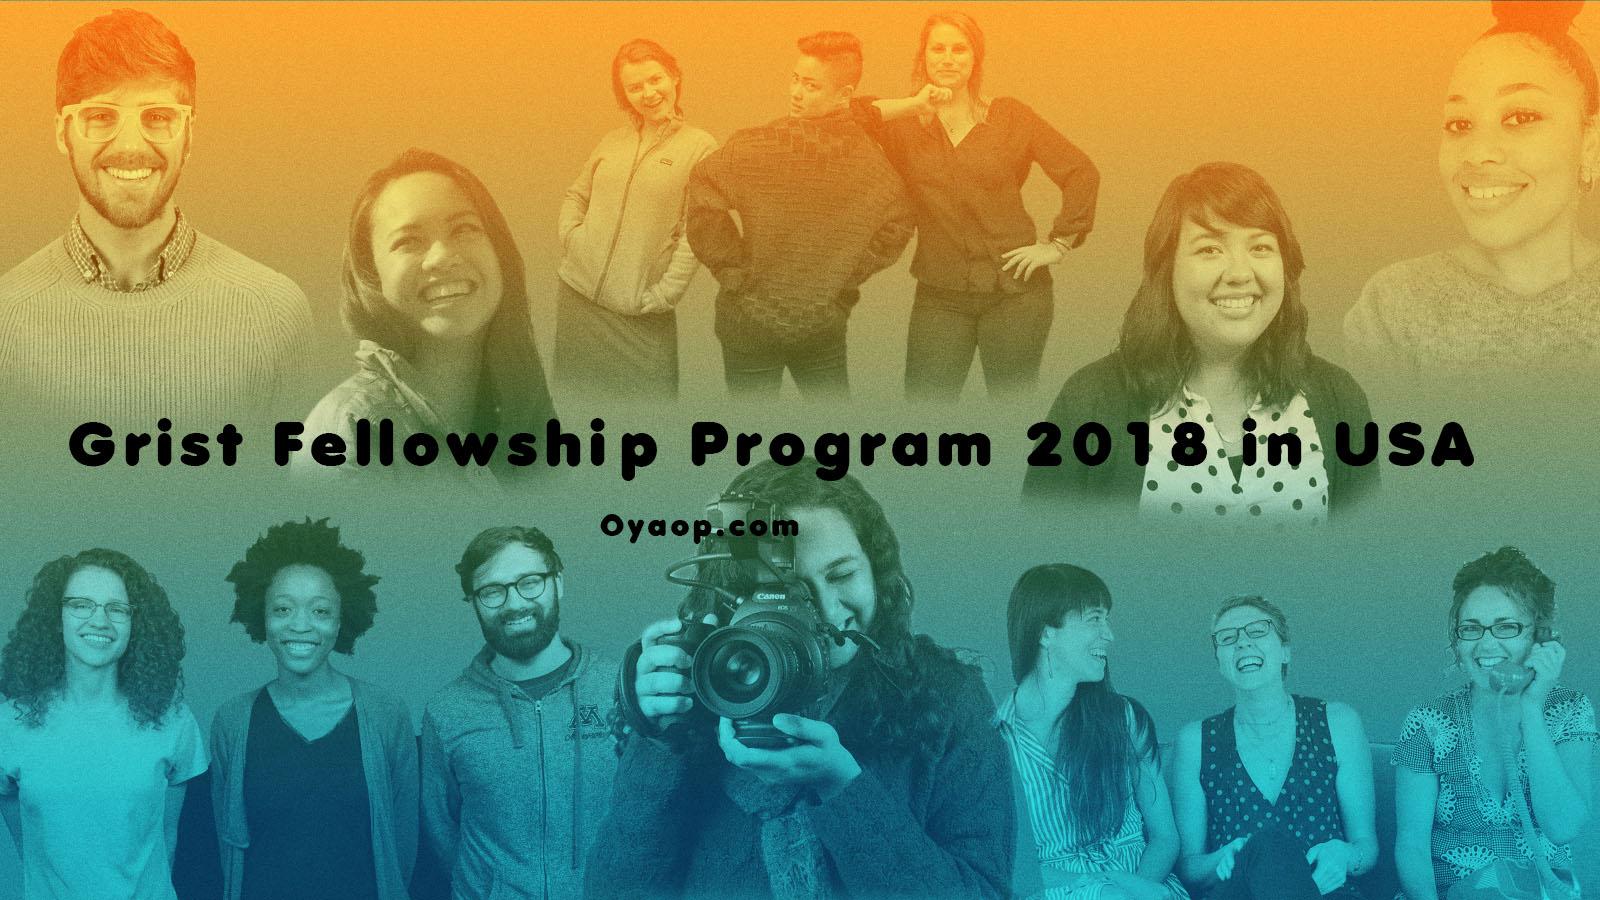 Grist Fellowship Program 2018 in USA